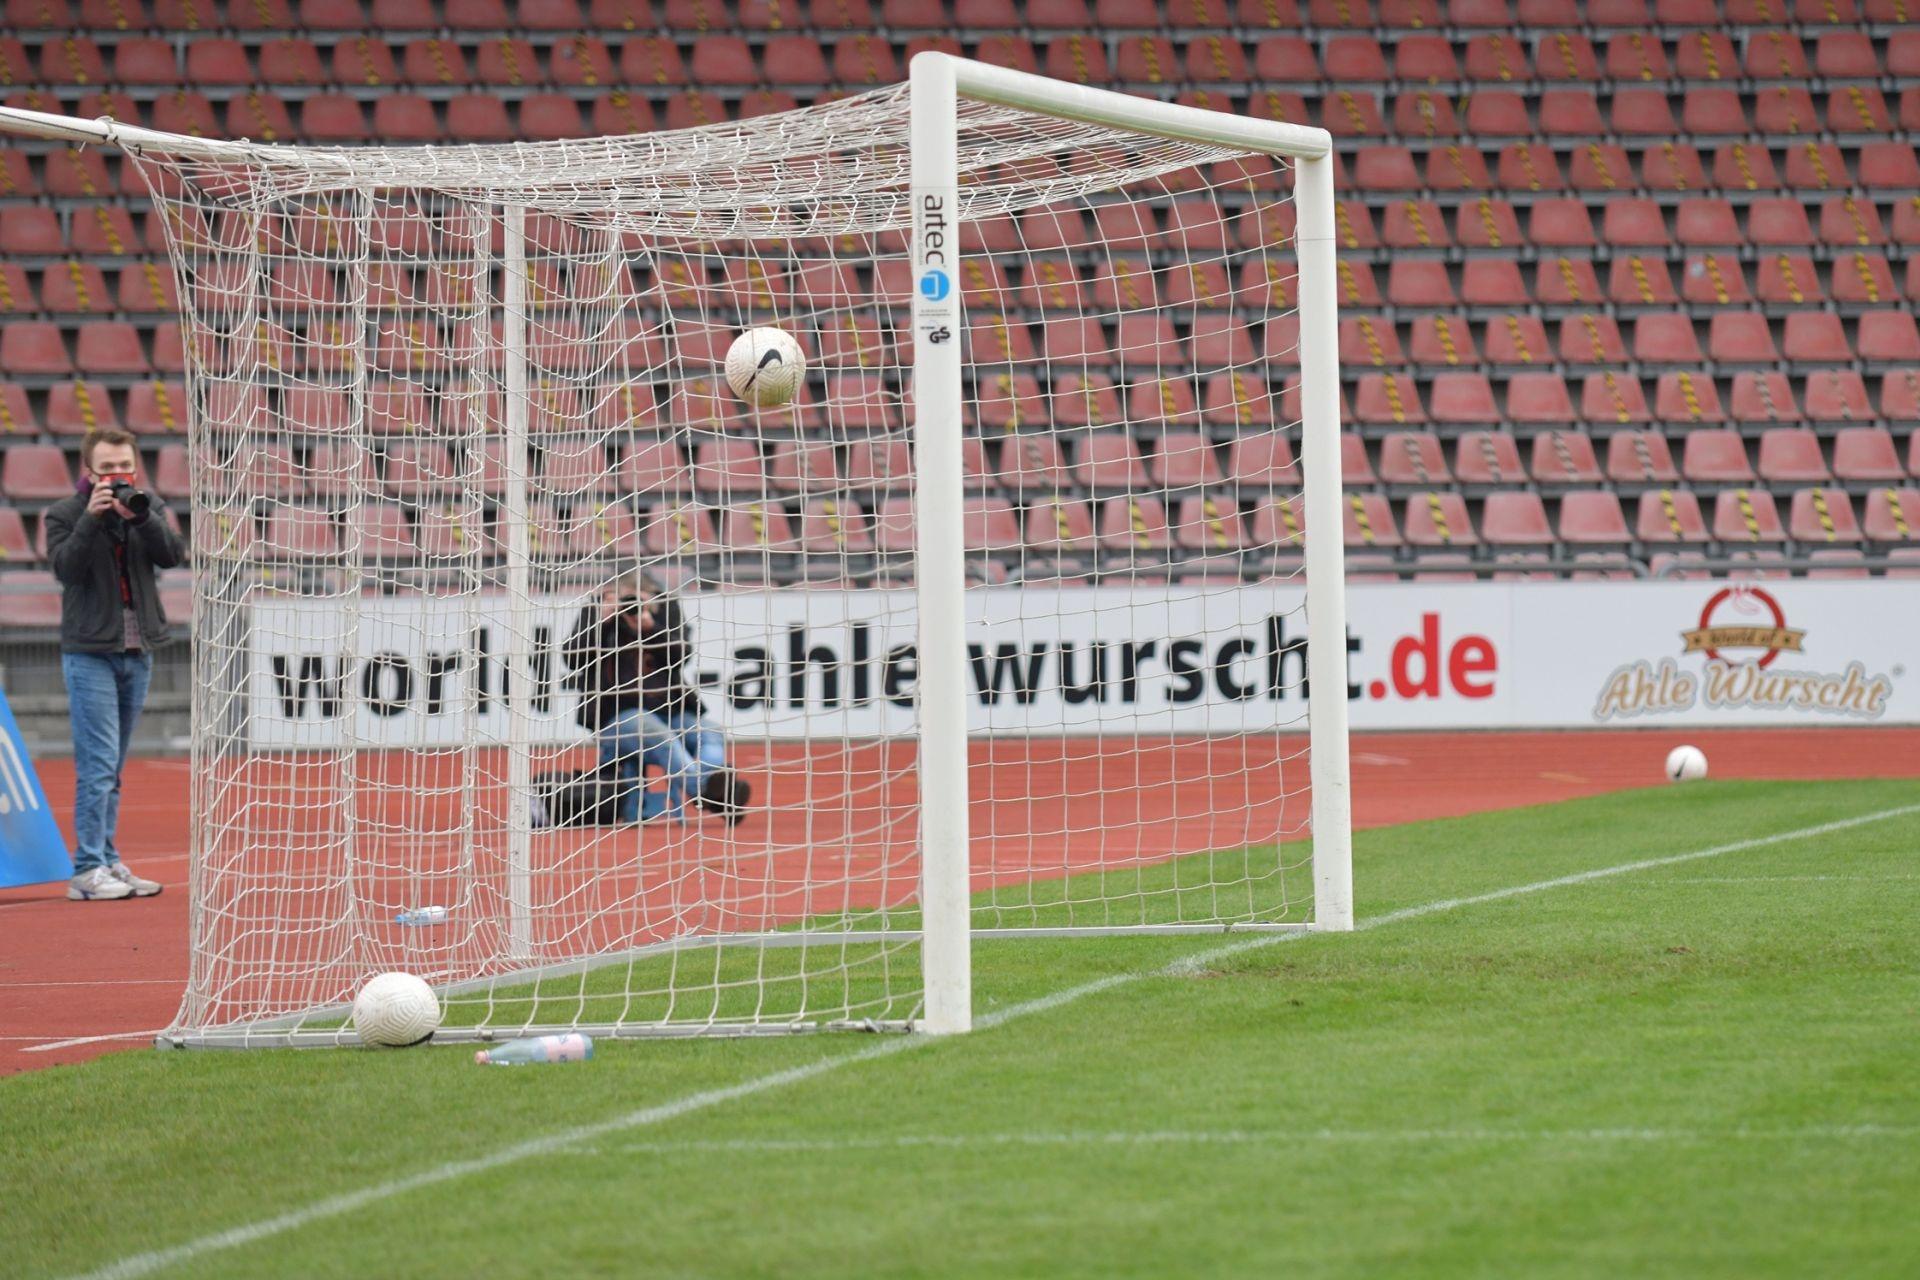 Regionalliga S�dwest 2020/21, KSV Hessen Kassel, 1. FSV Mainz 05 II, Endstand 2:1, Tor zum 2:0, Leeres Tor